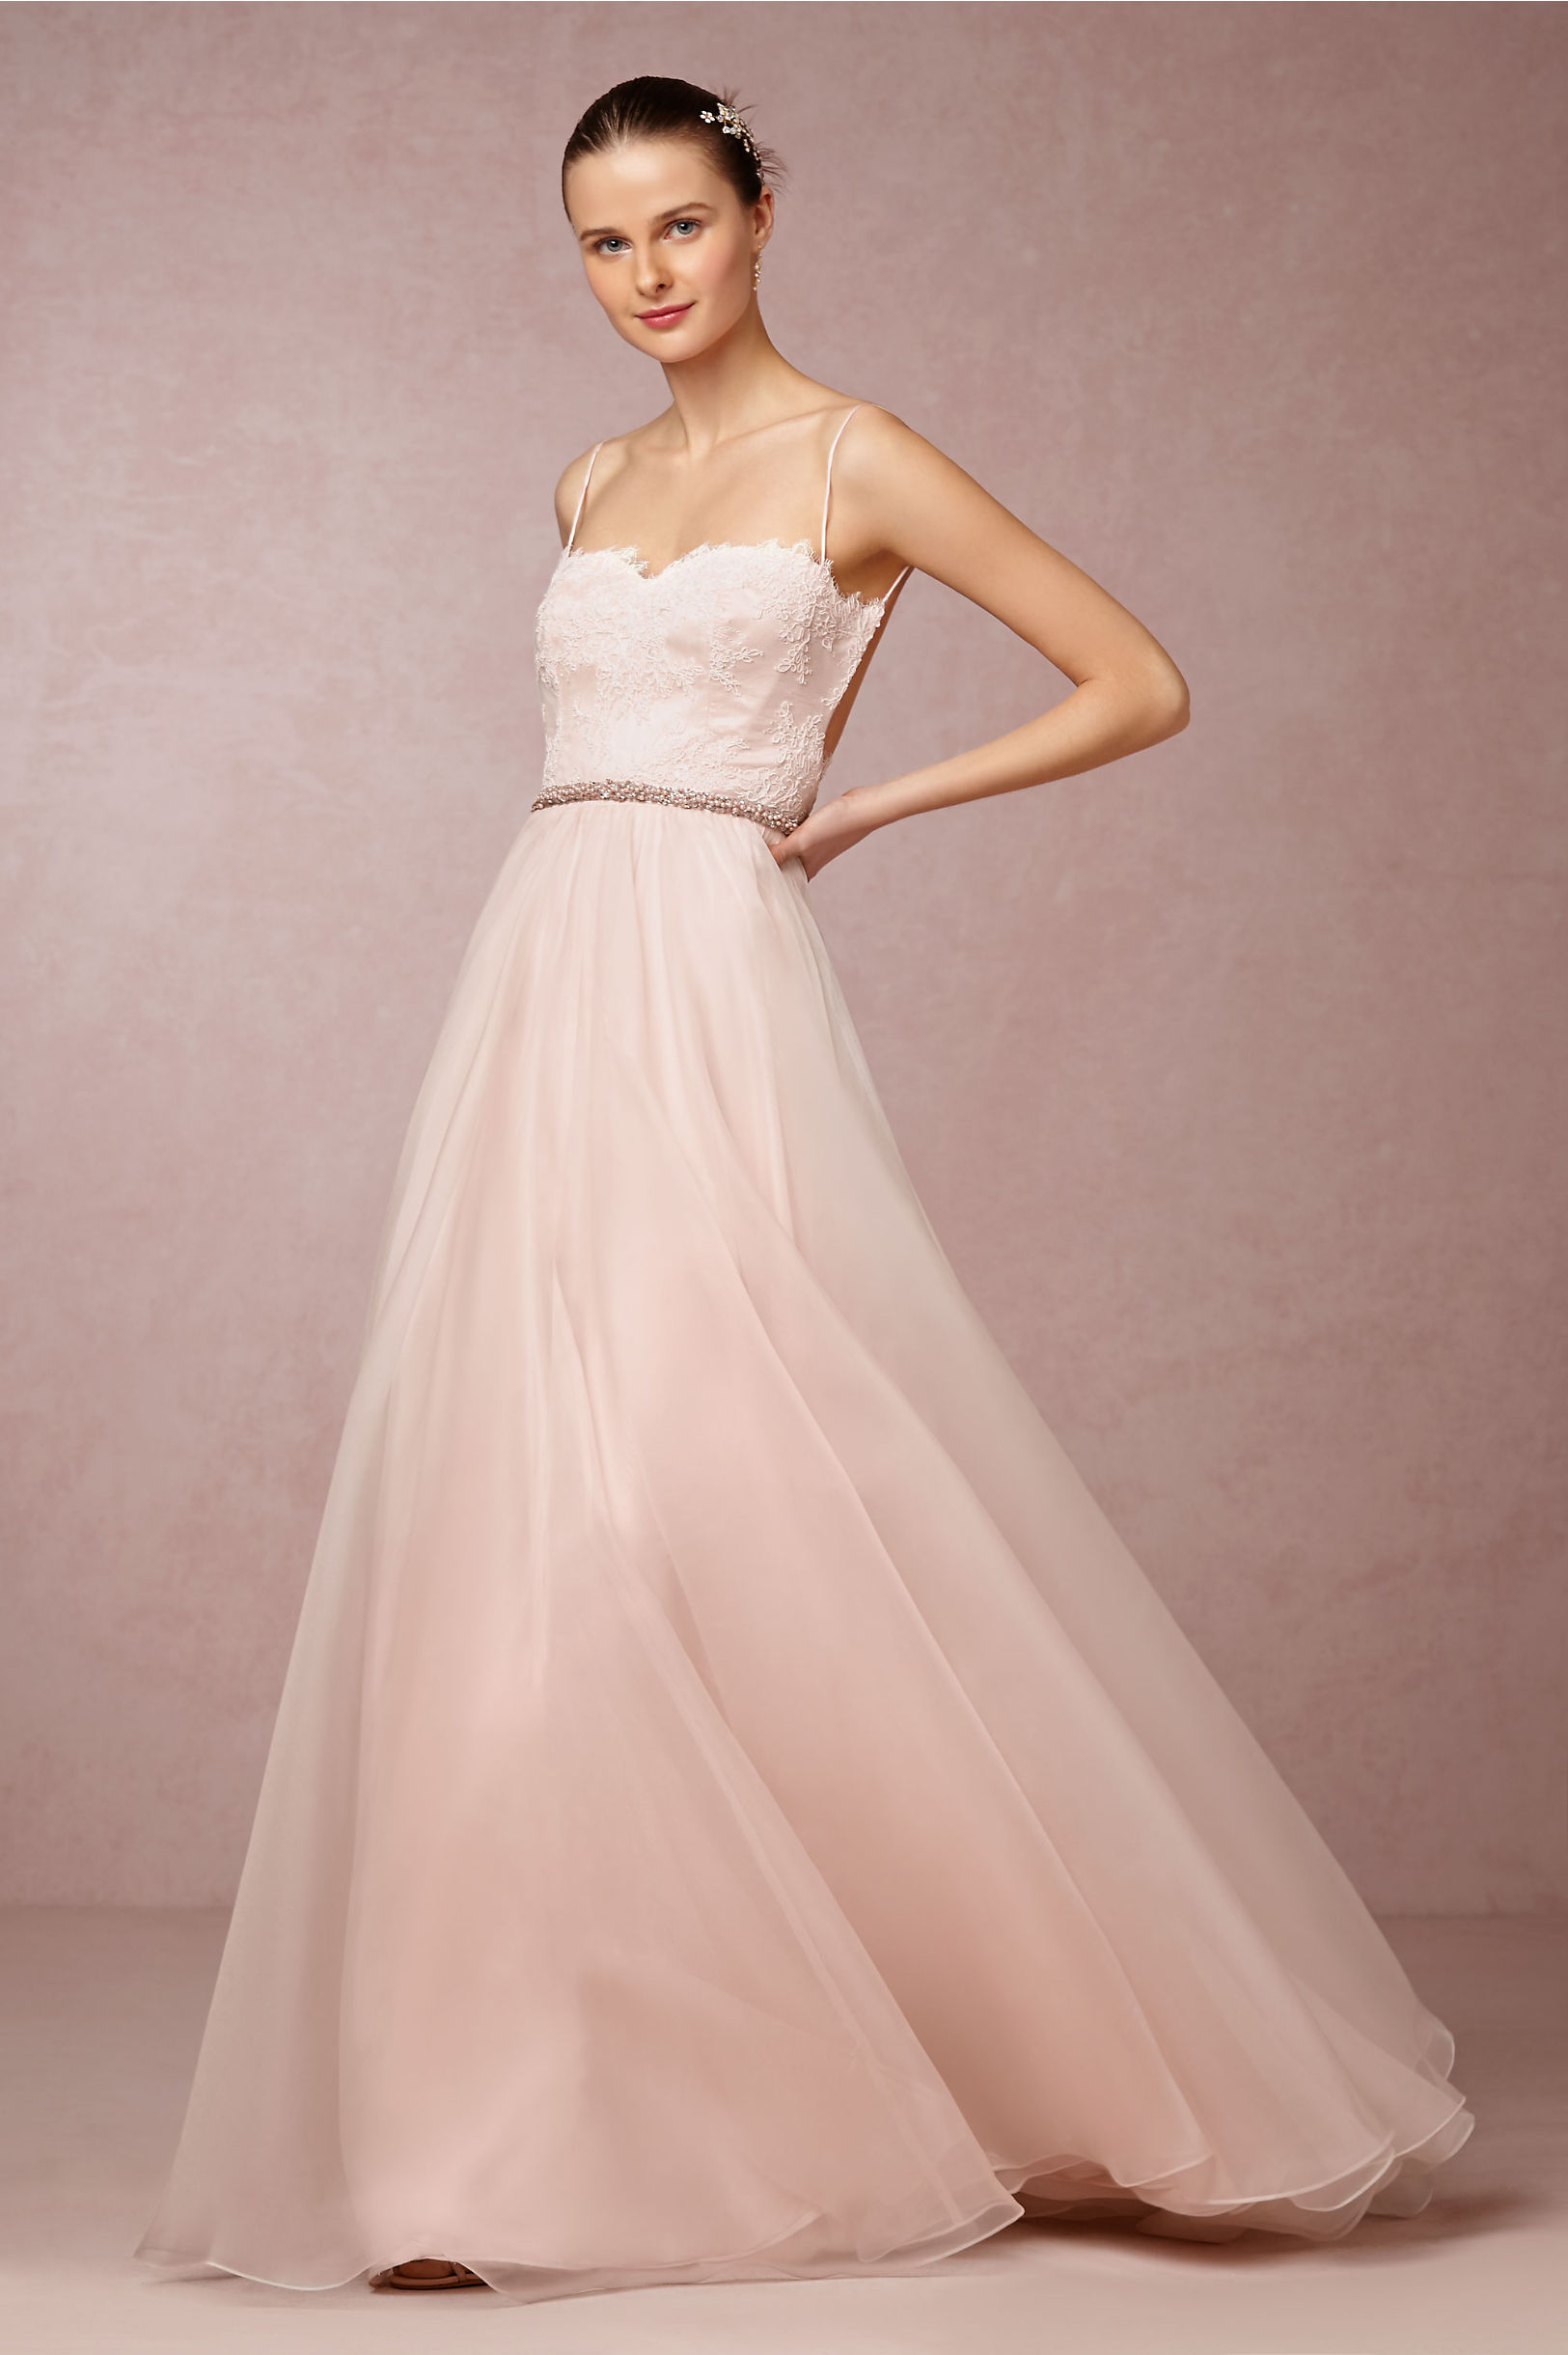 Cool Elena Wedding Dress Images - Wedding Dress Ideas - sagecottage.us